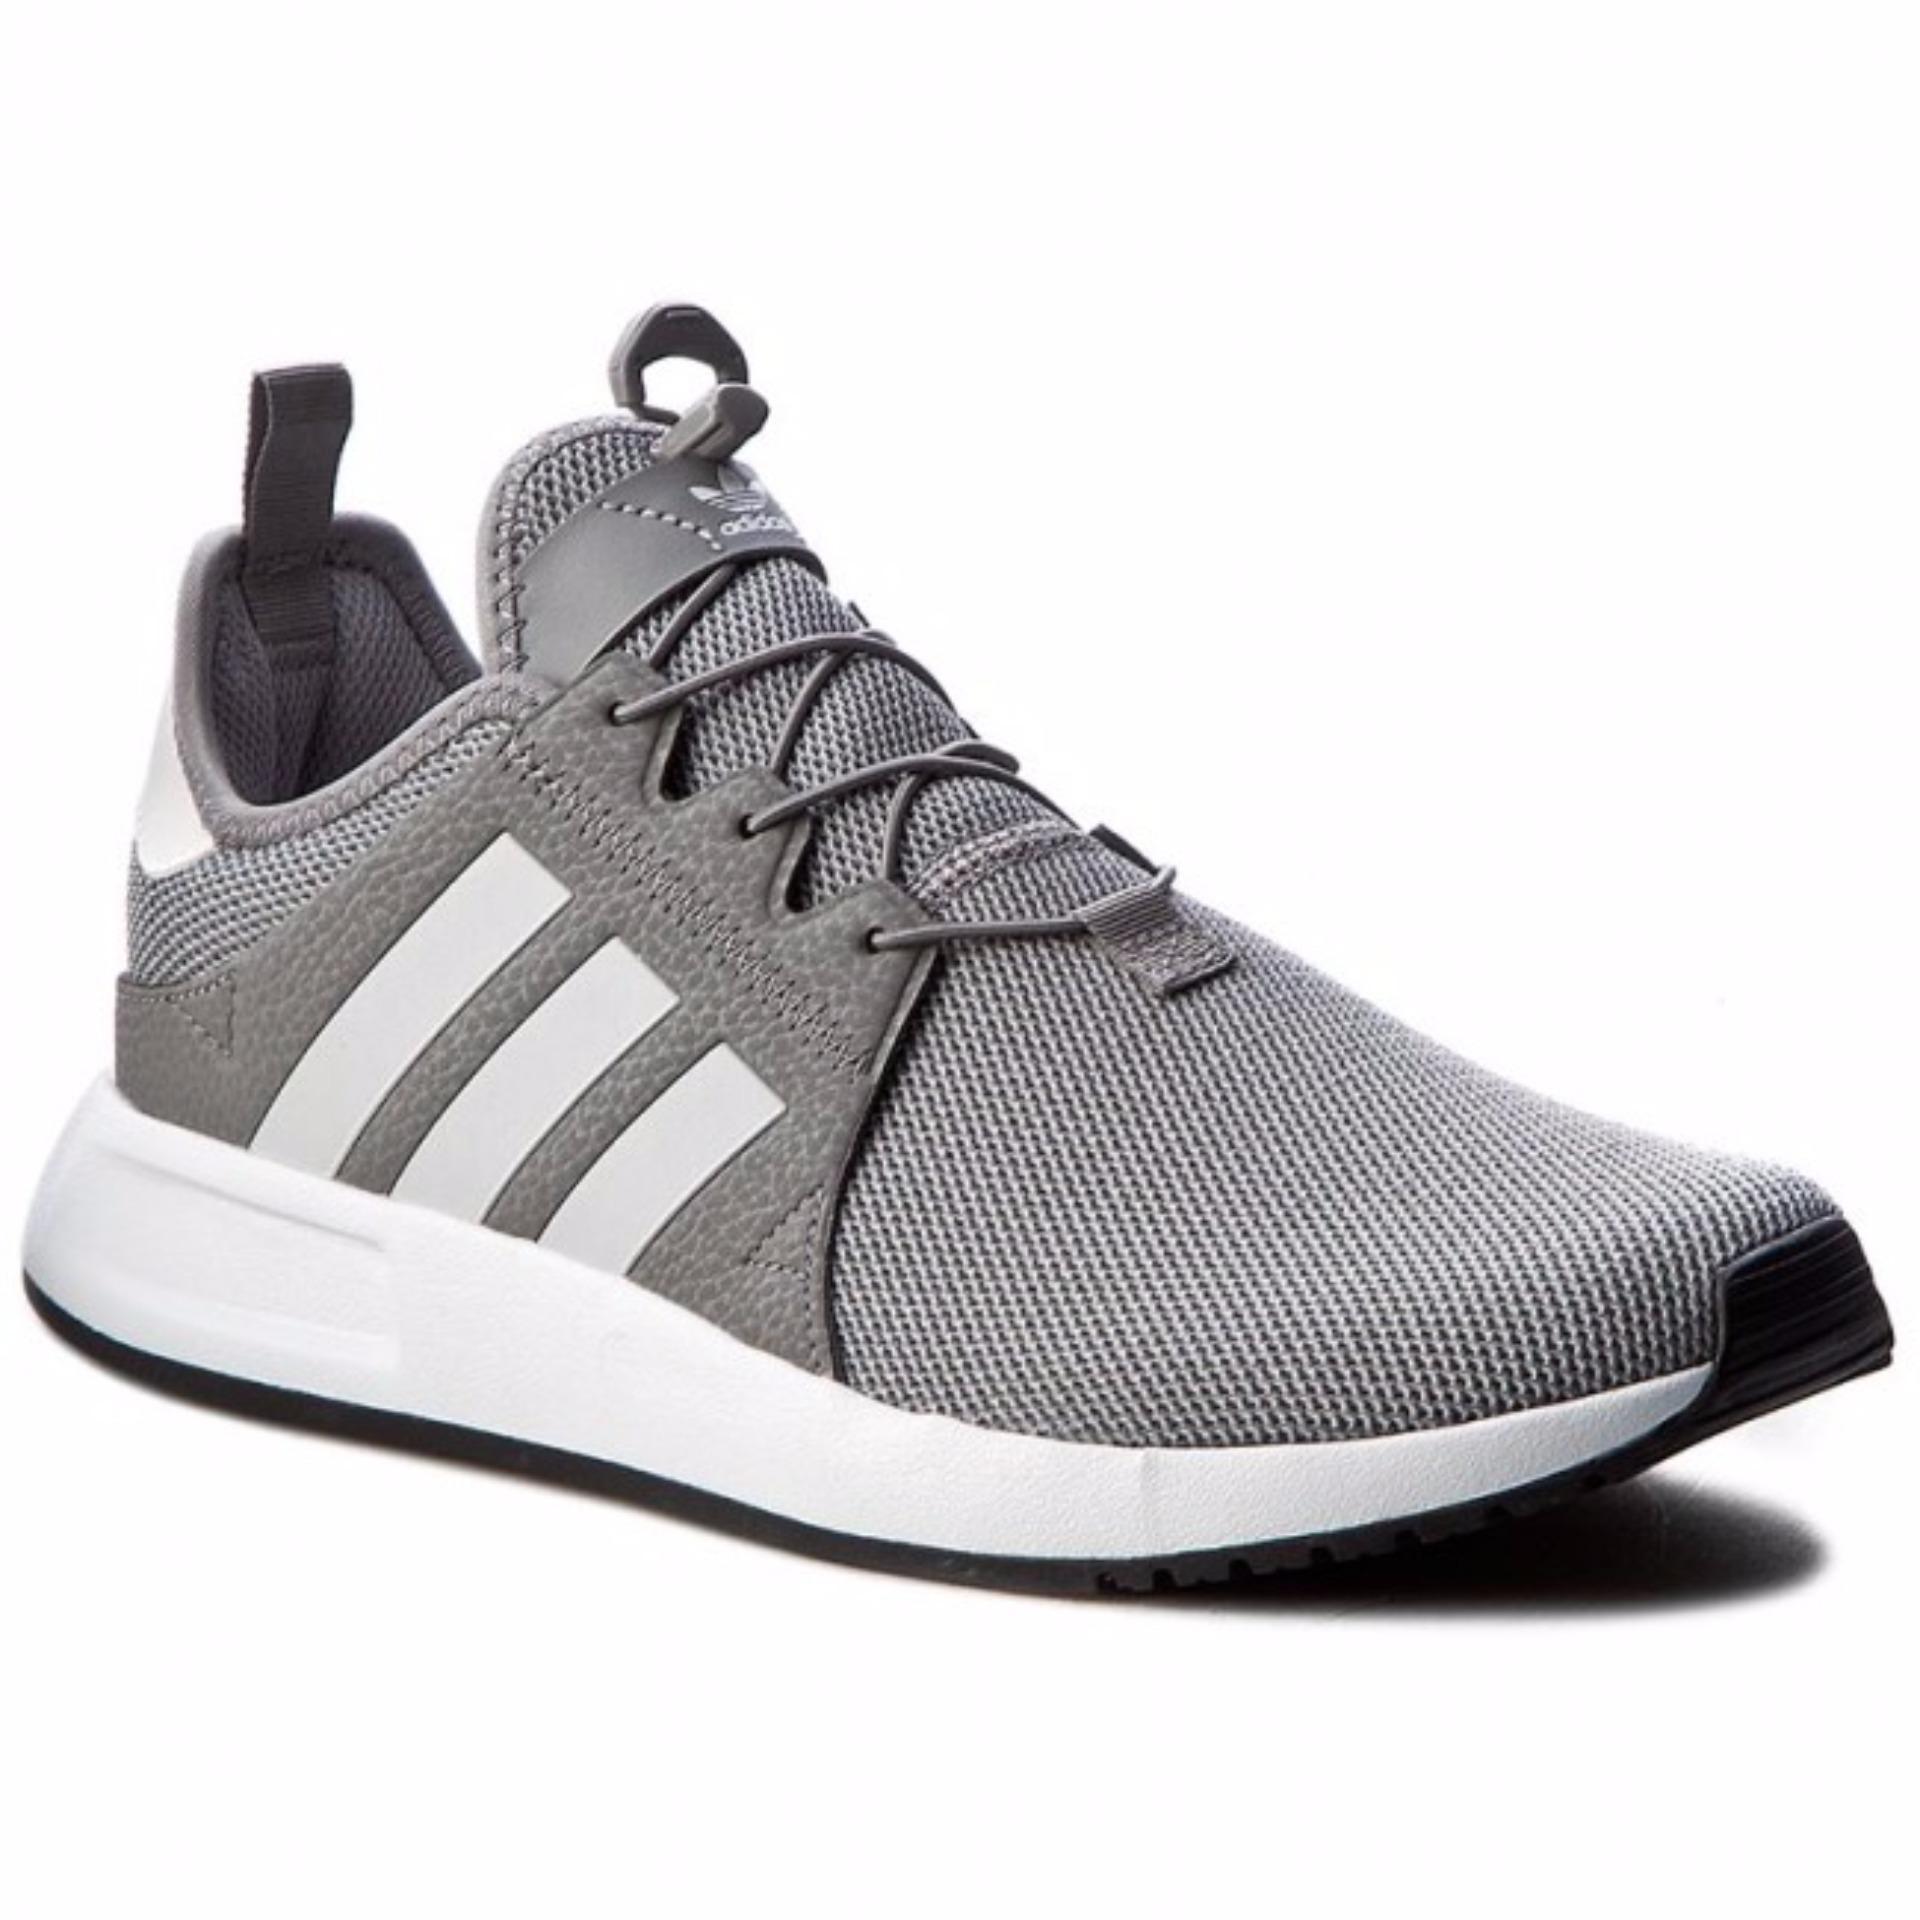 Adidas Sneaker X PLR - BB1111 - Abu  d7baebab5c